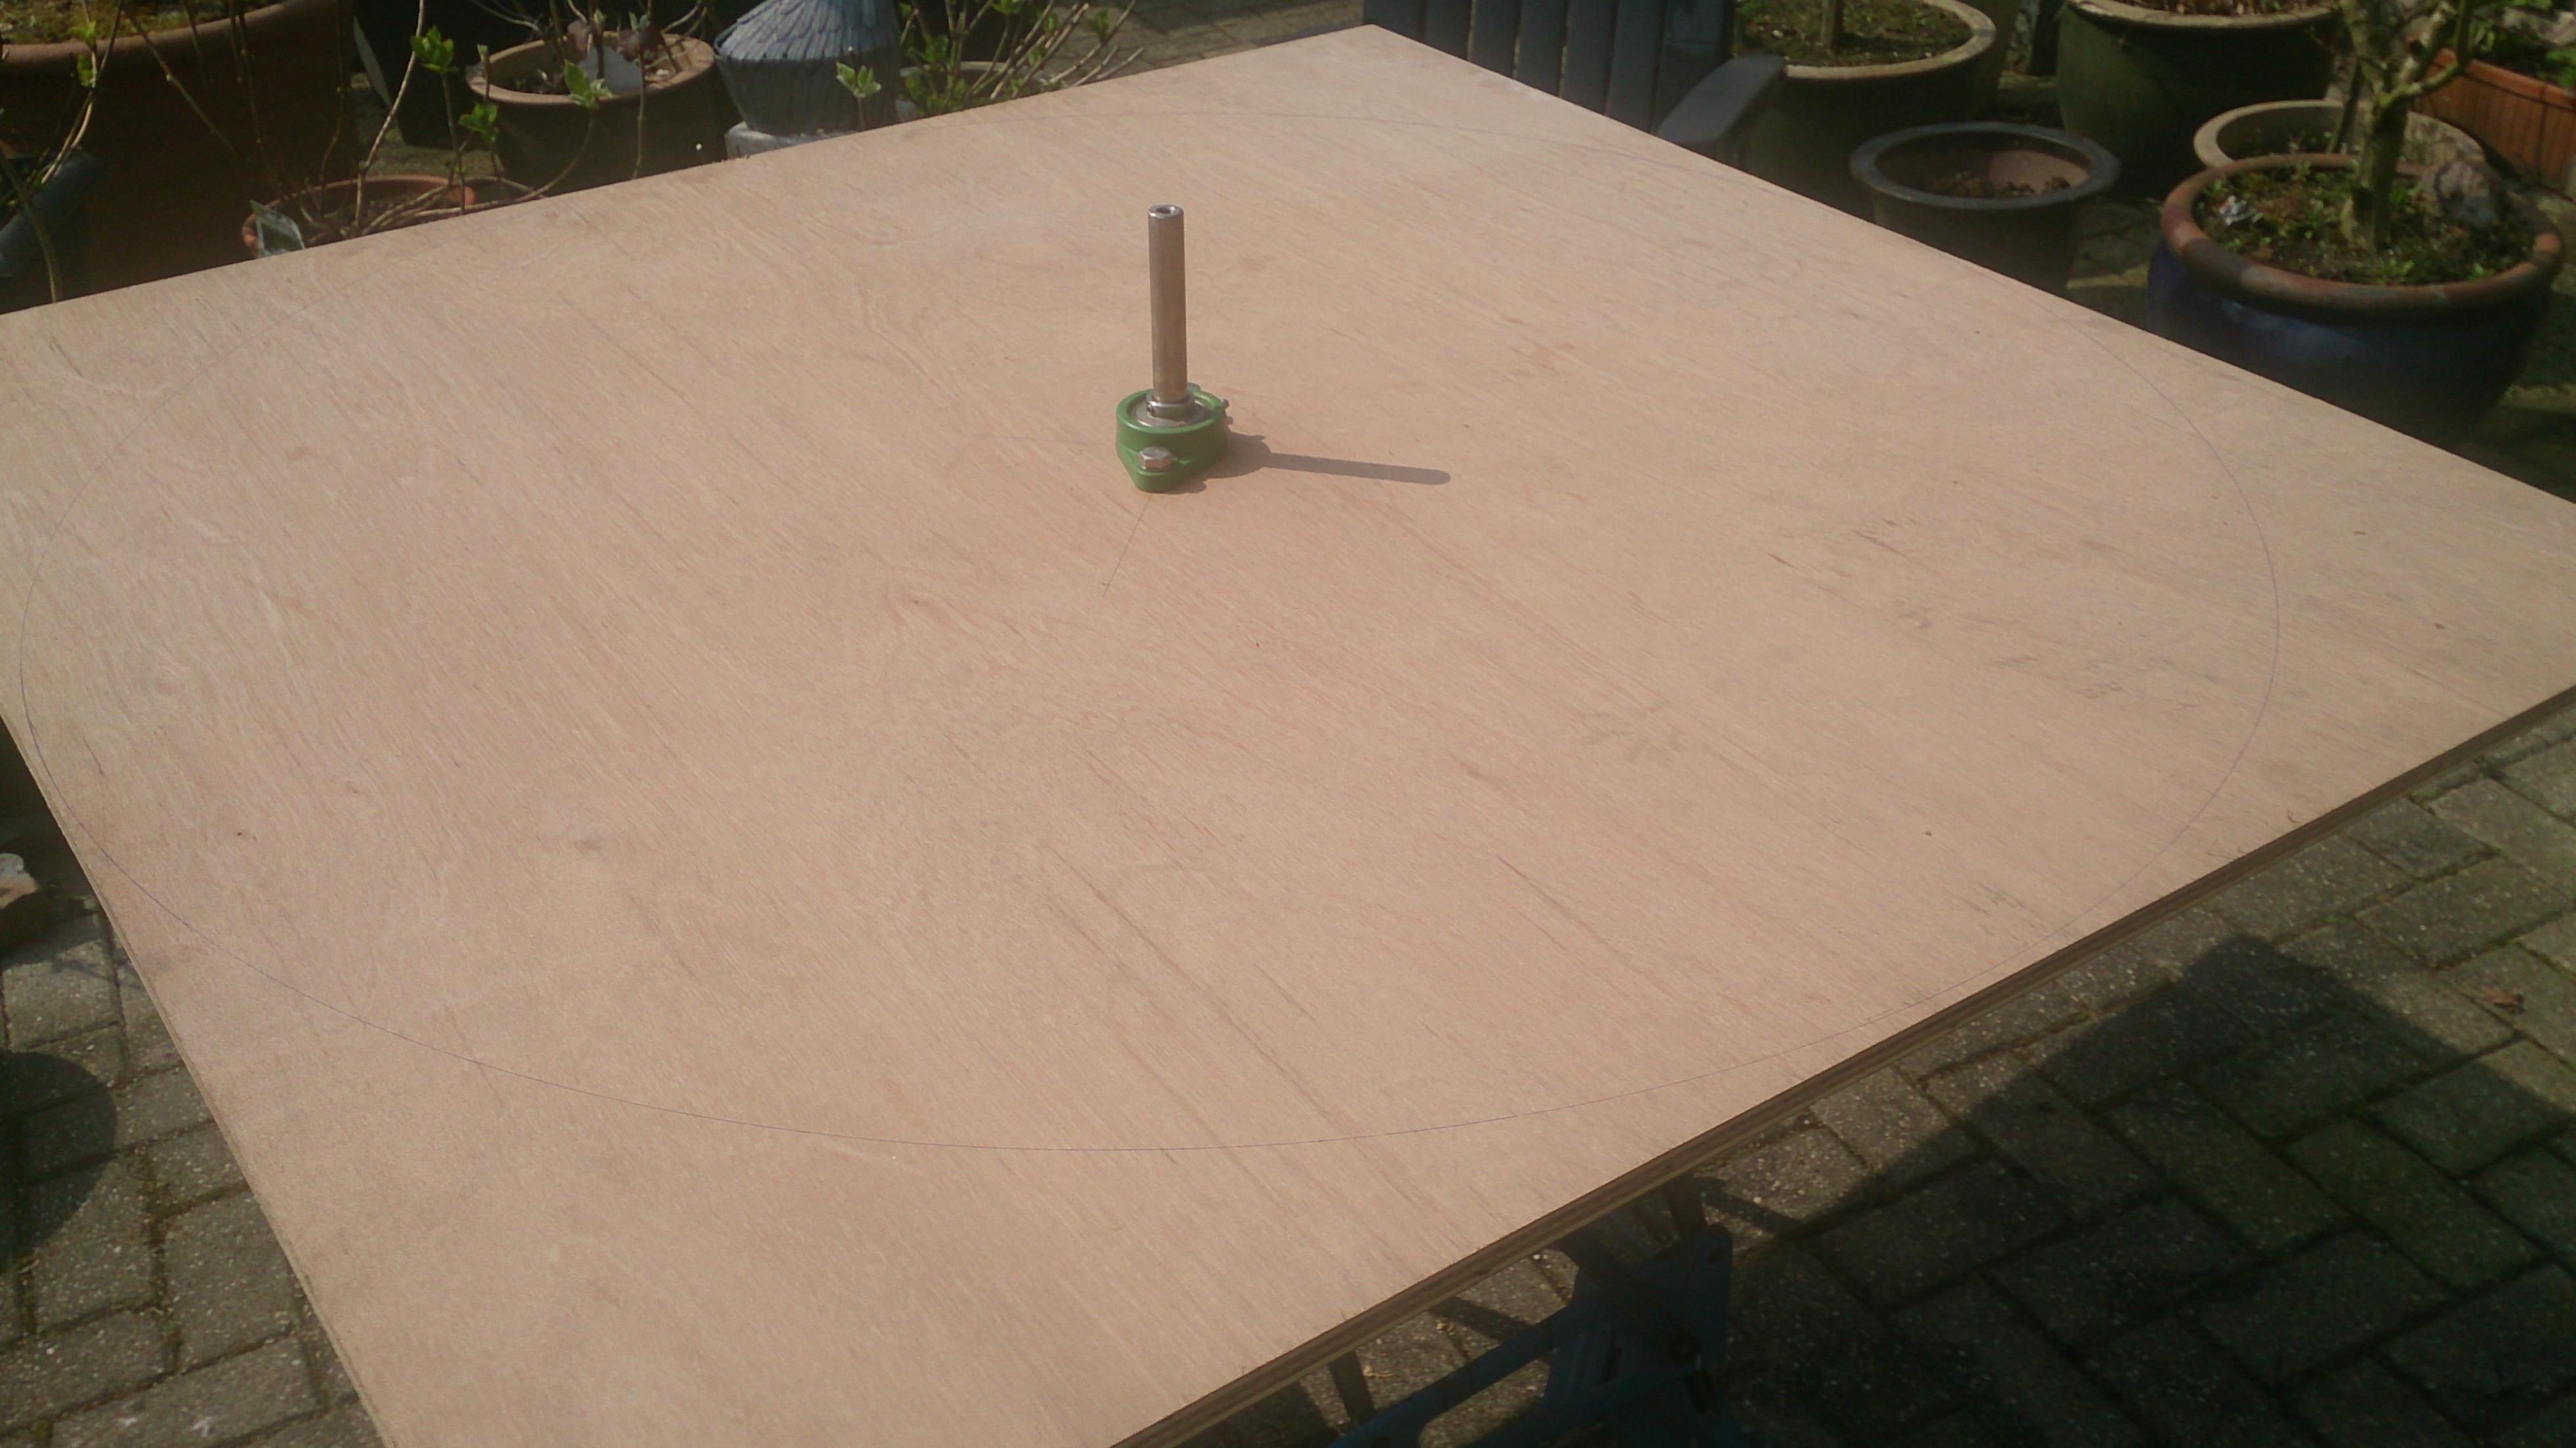 hardwood floor refinishing eugene oregon of http imgur com gallery 5gemi weekly http imgur com xhctyig throughout nonzm4n